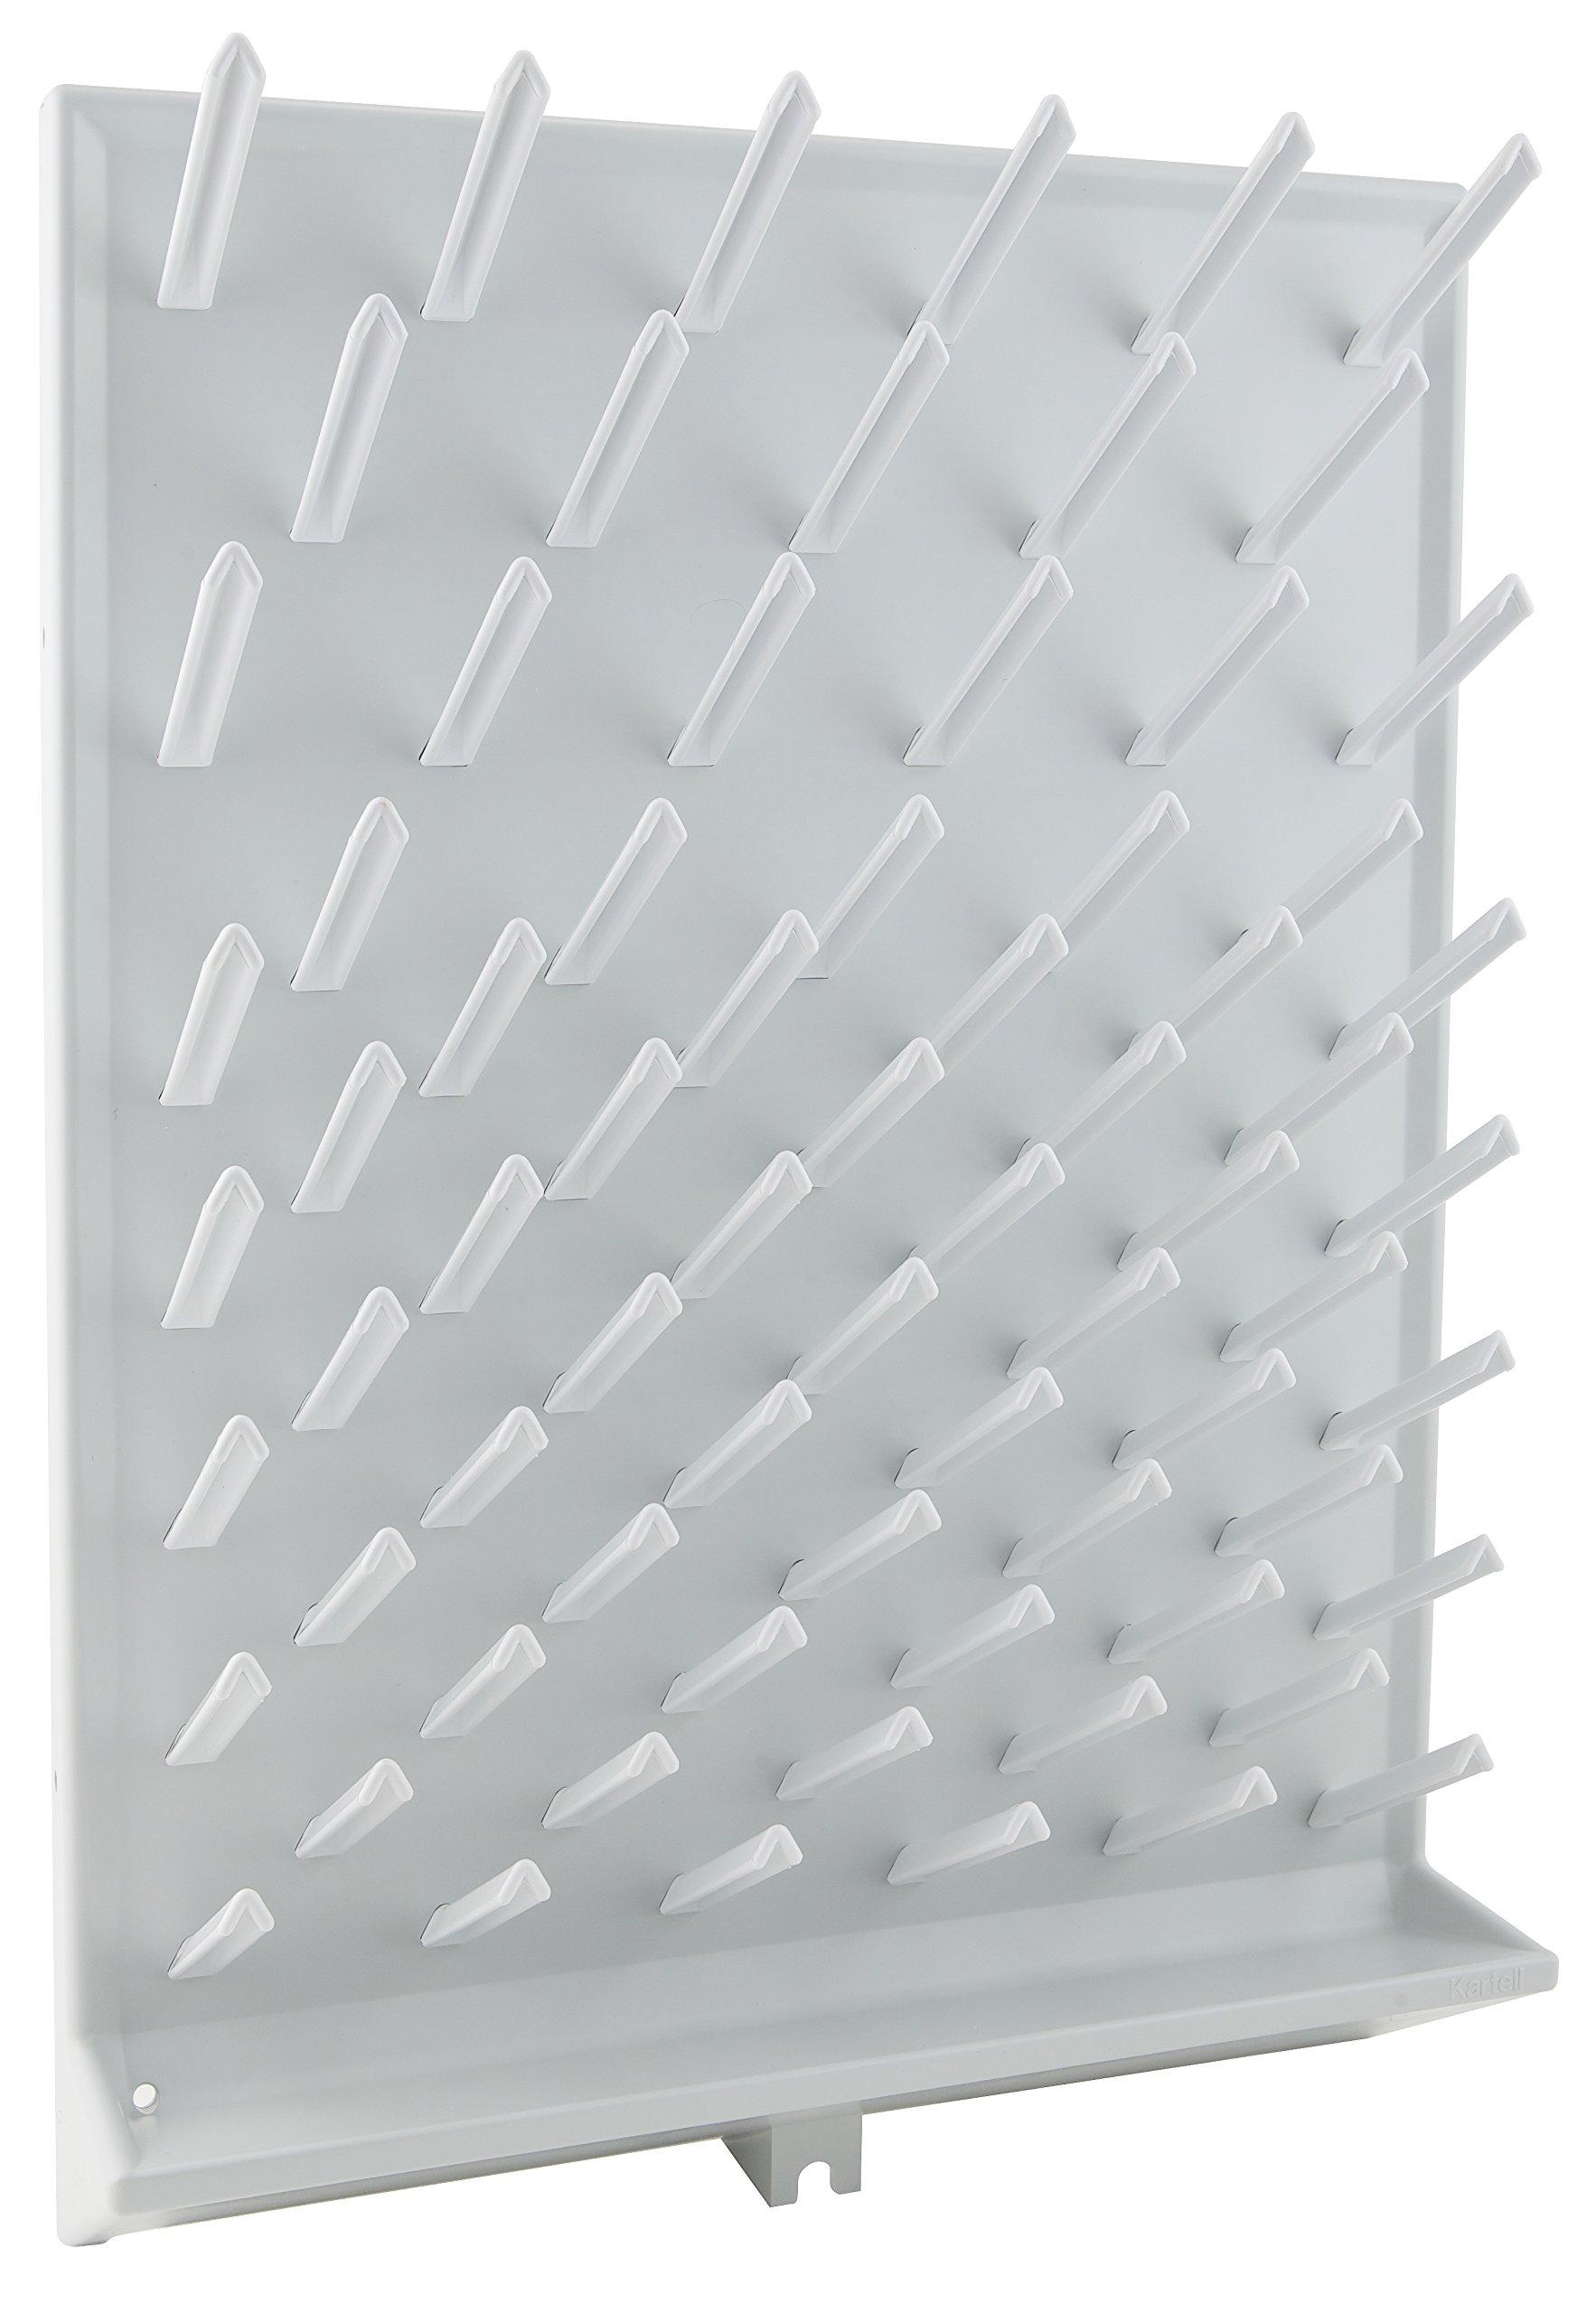 Dynalon 259184 72 Place Drying Rack, Polystyrene, Milliliters, Degree C, Polystyrene, White (